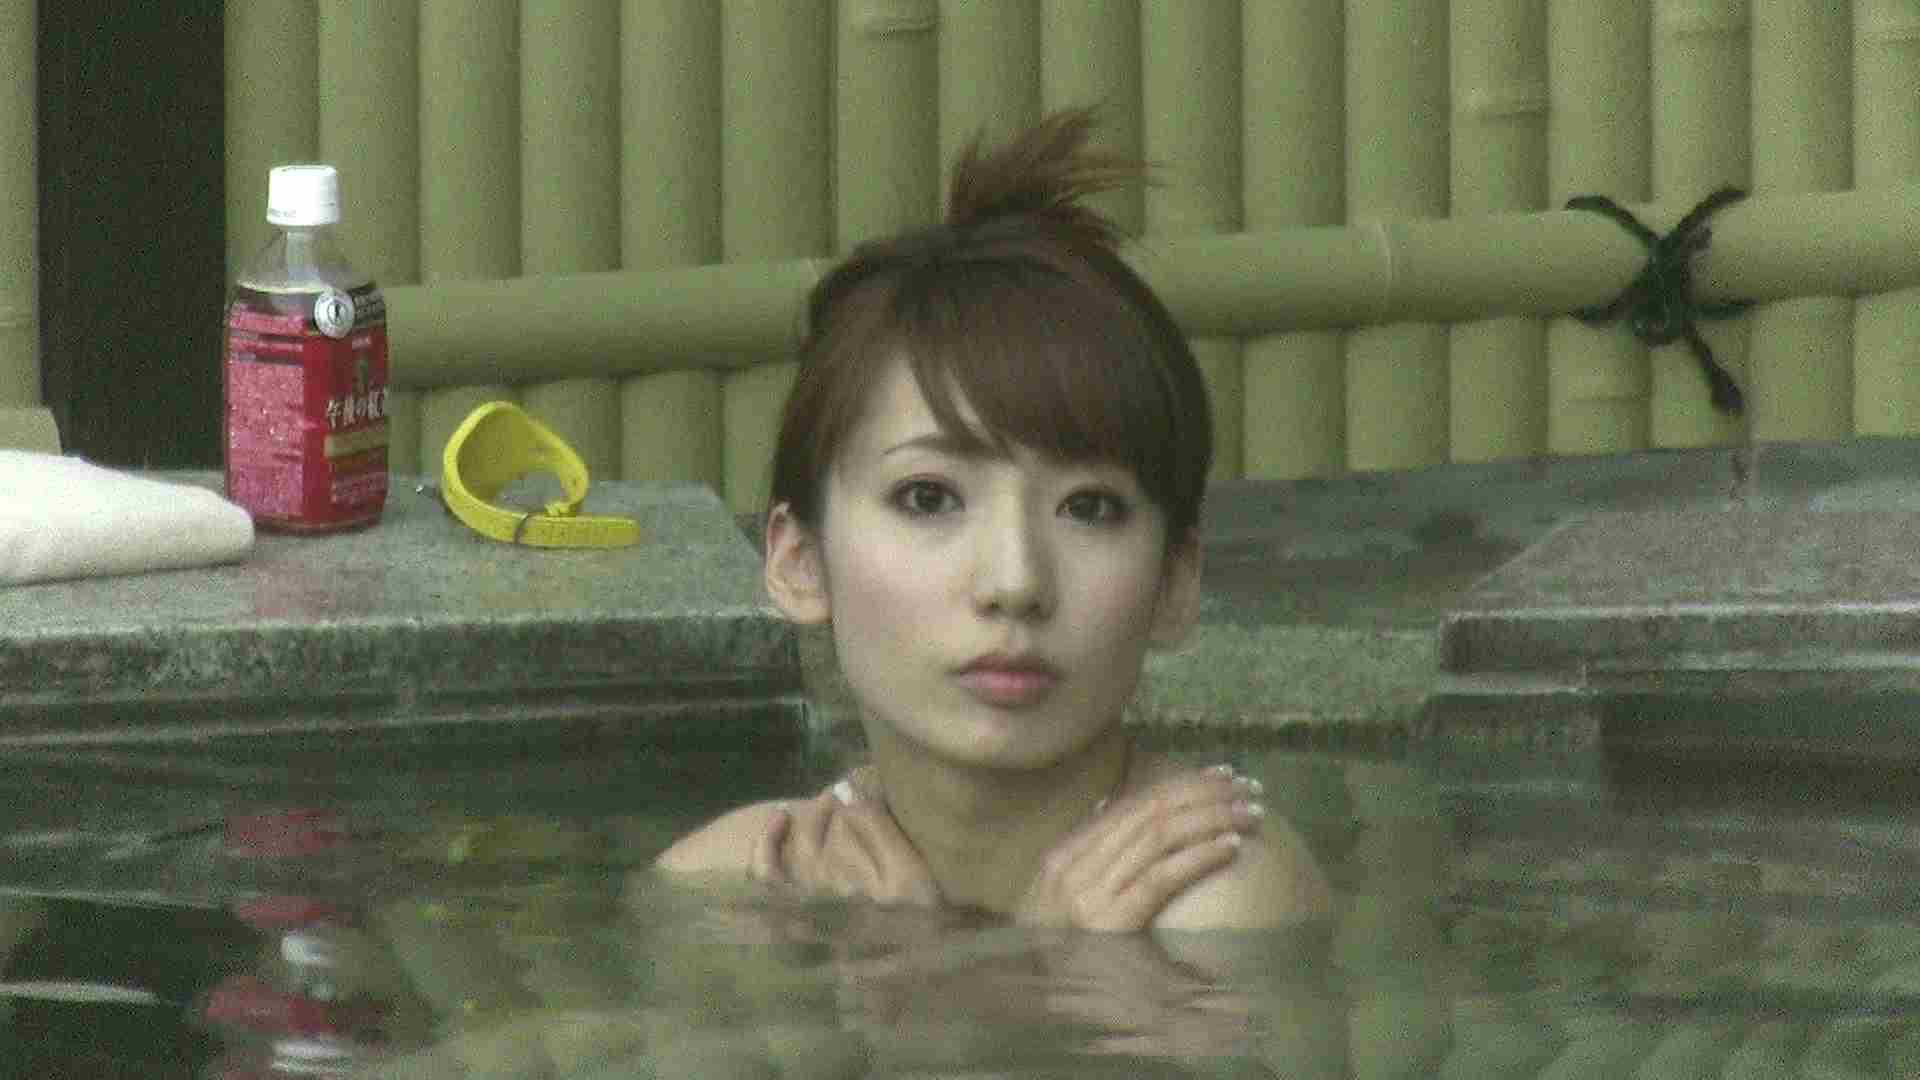 Aquaな露天風呂Vol.208 盗撮 隠し撮りオマンコ動画紹介 85画像 5